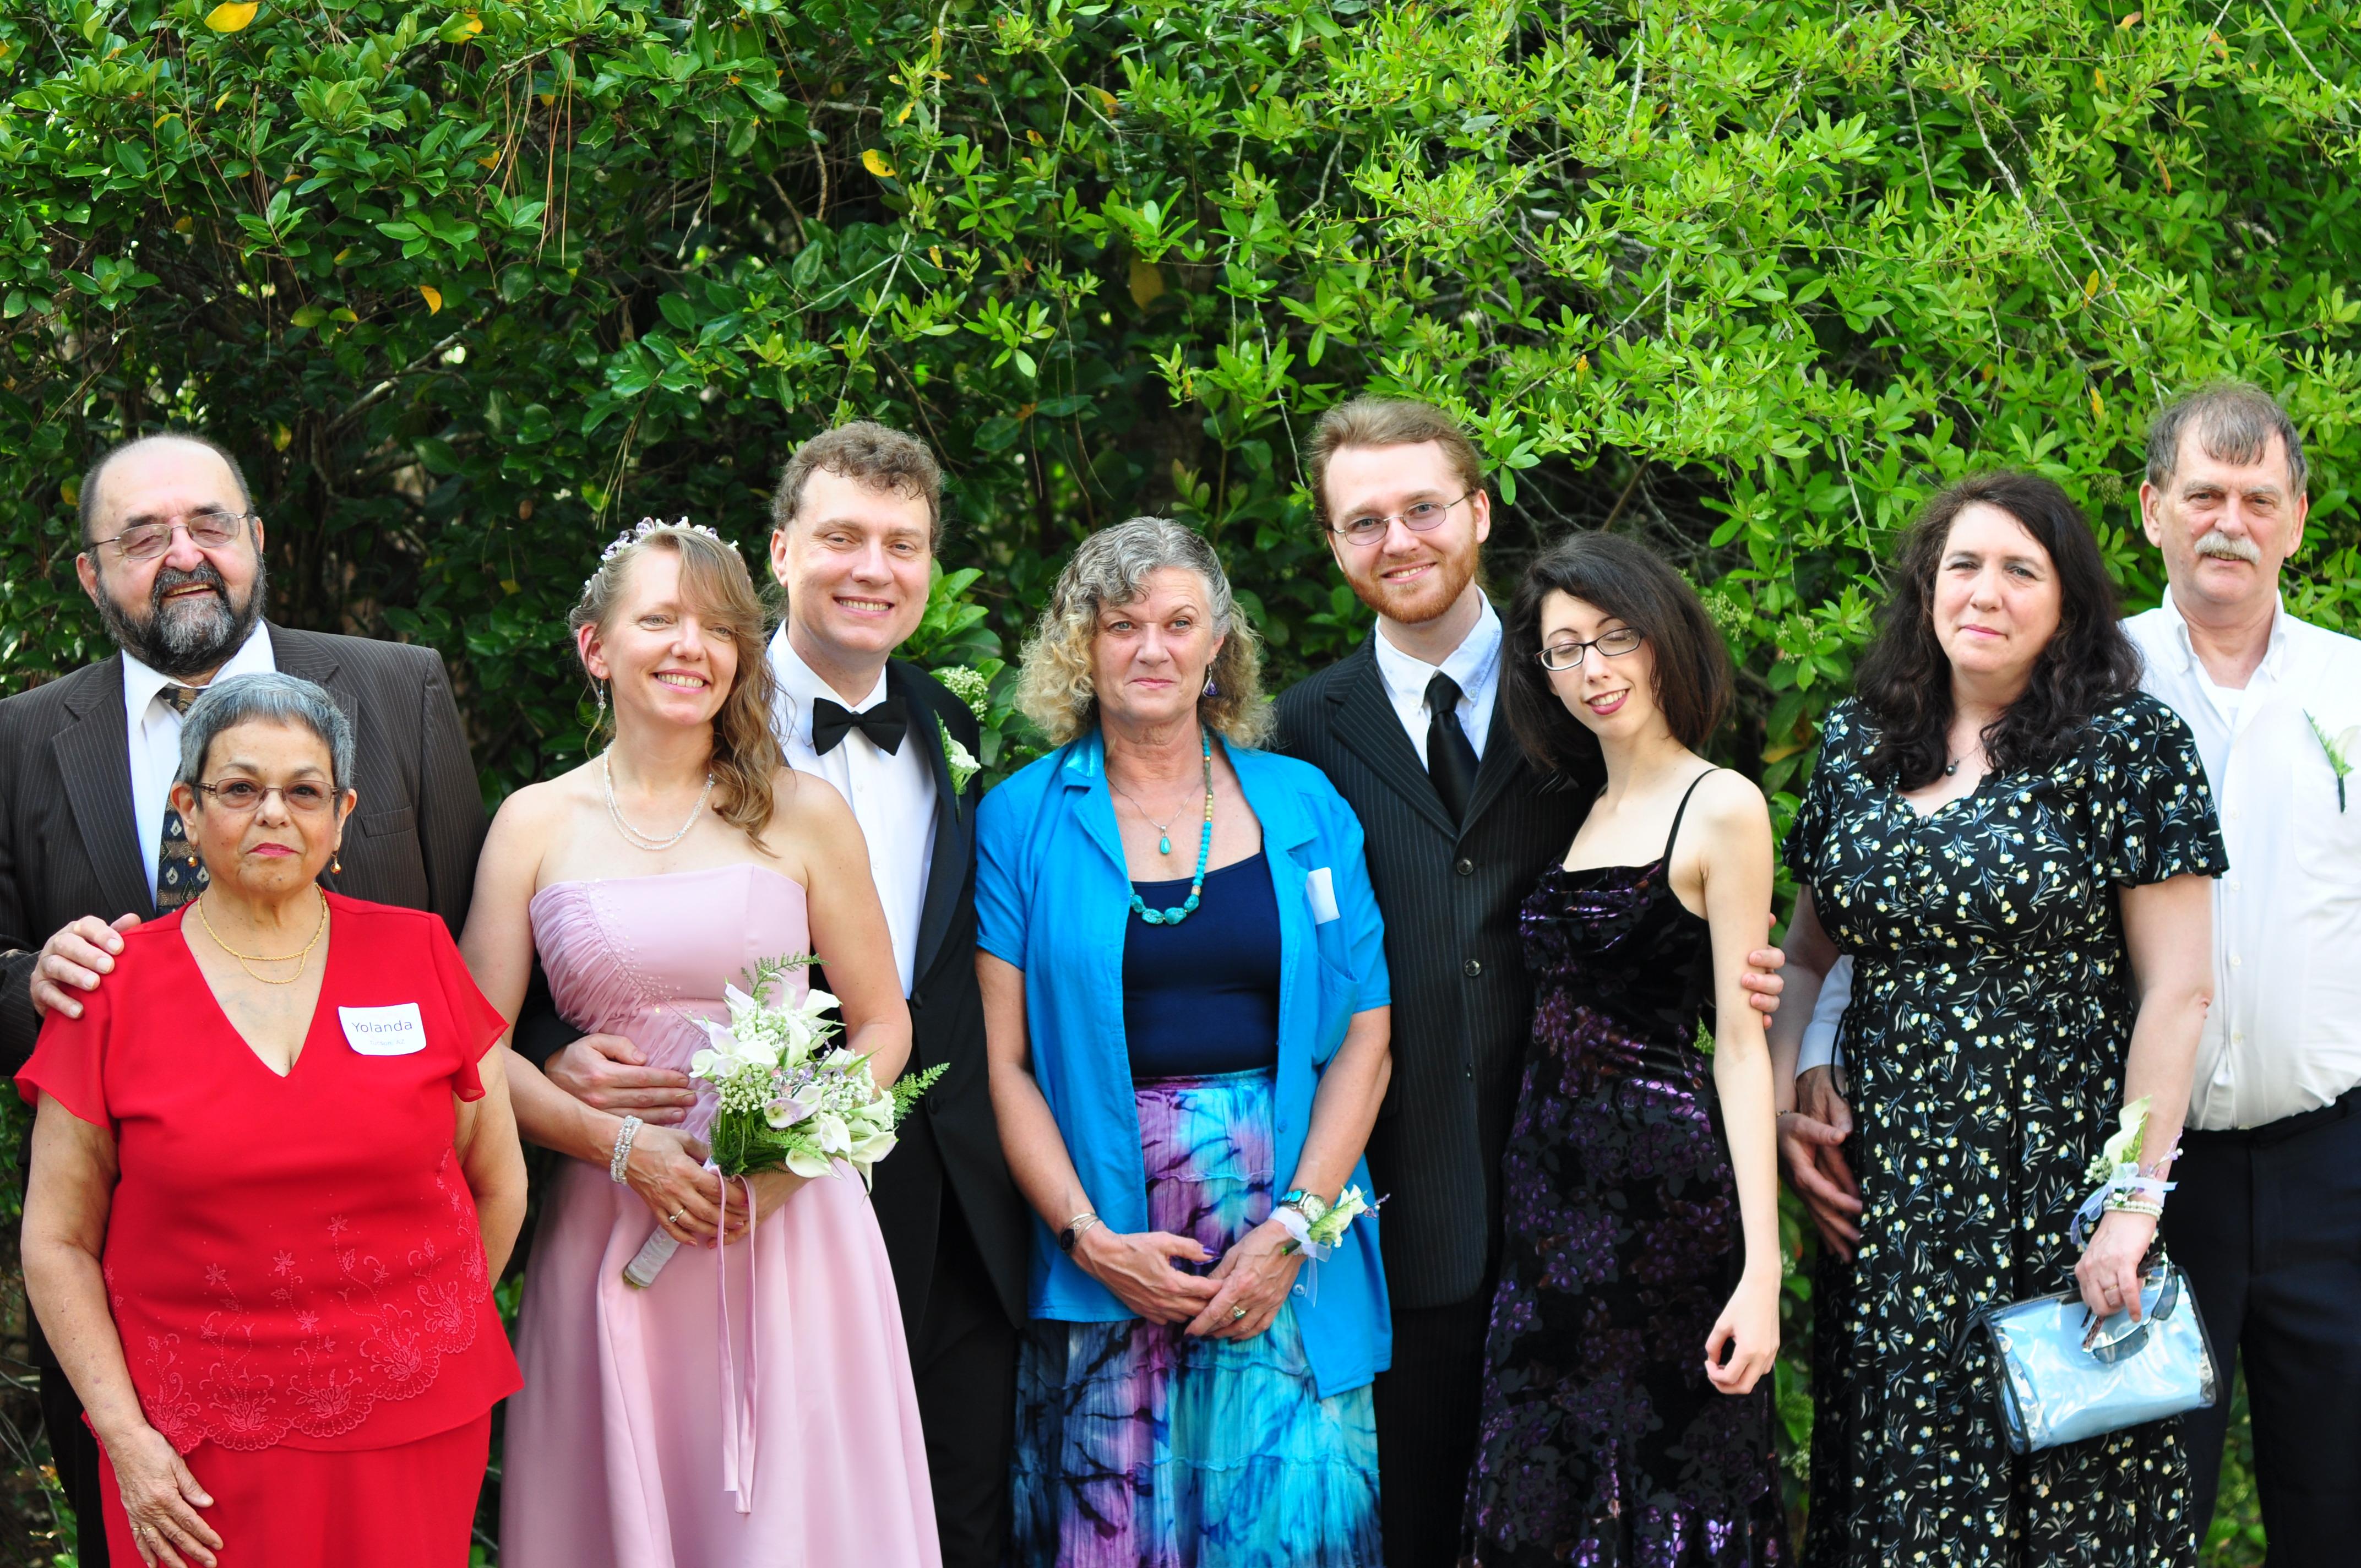 emily-and-travis-4-1-2013-april-fools-wedding-356